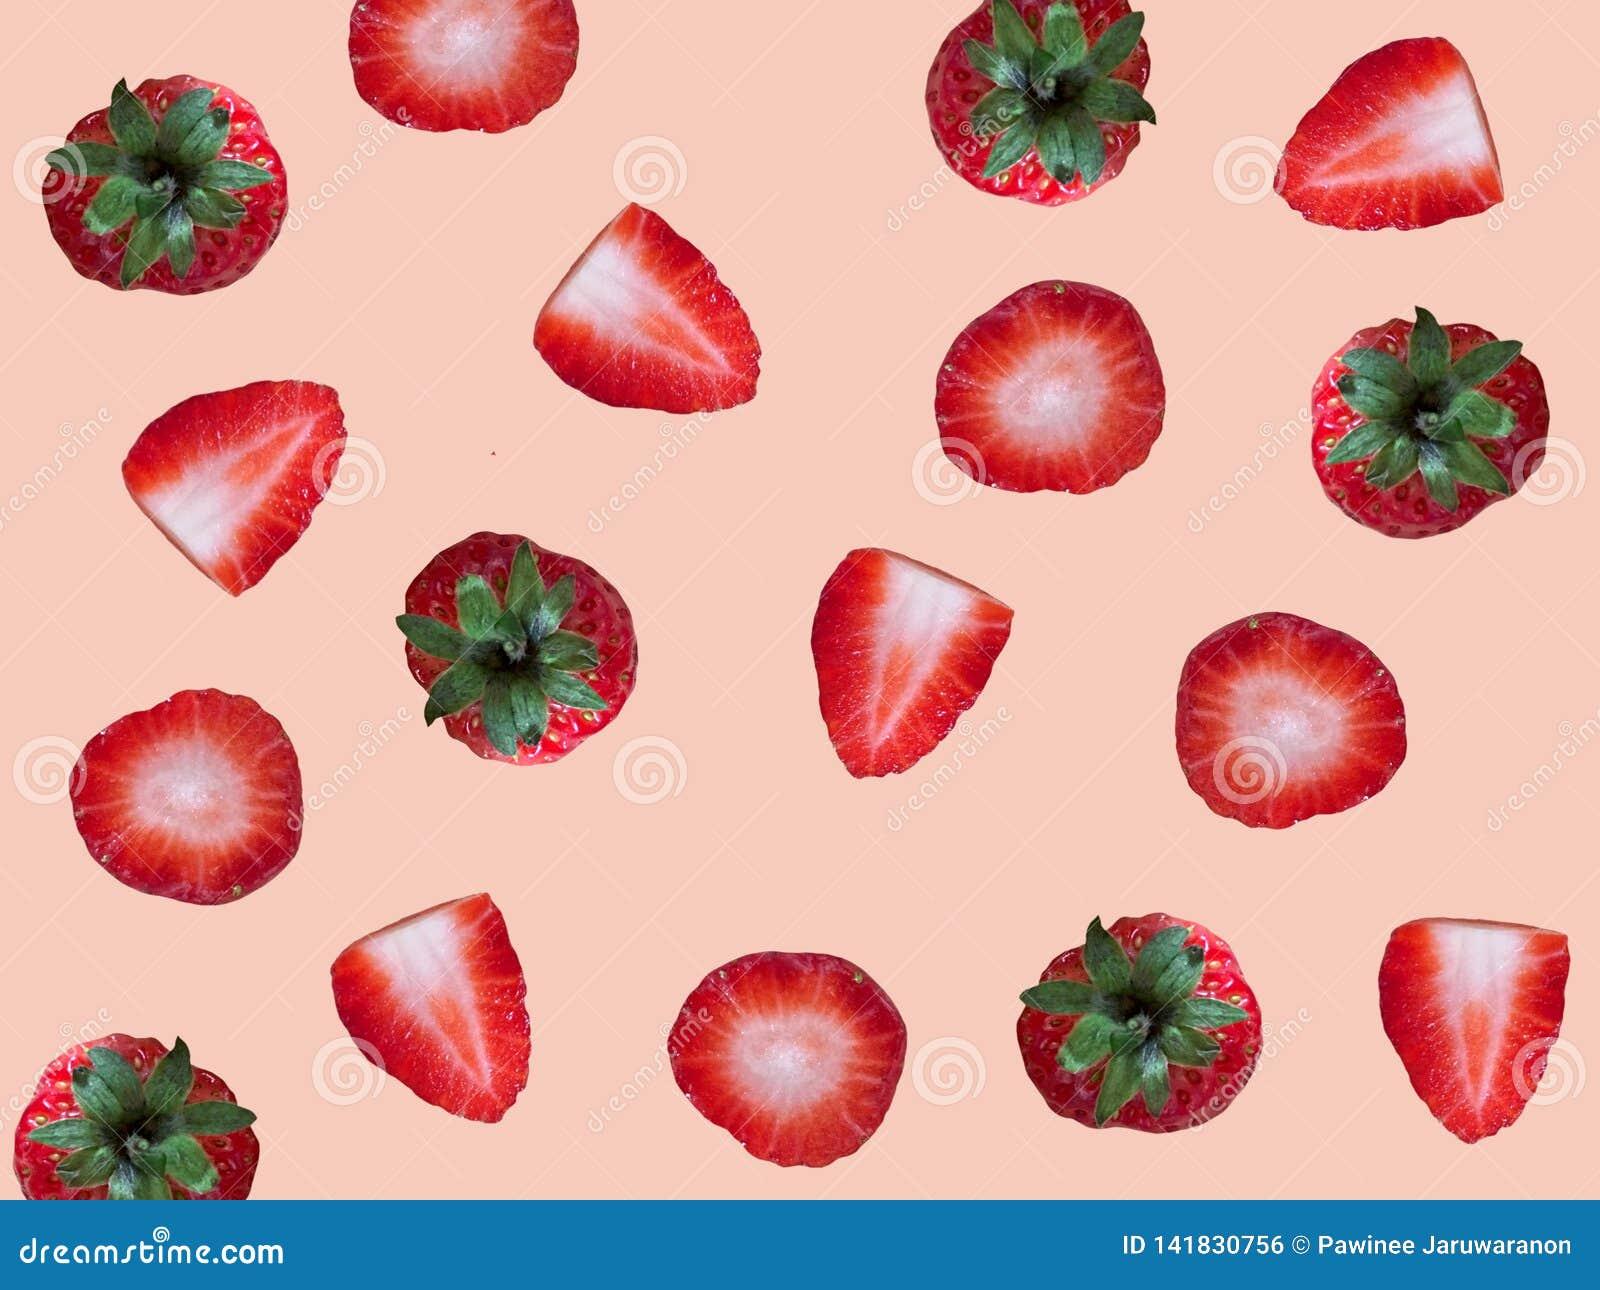 Fresh ripe strawberry pattern isolated on light pink background.